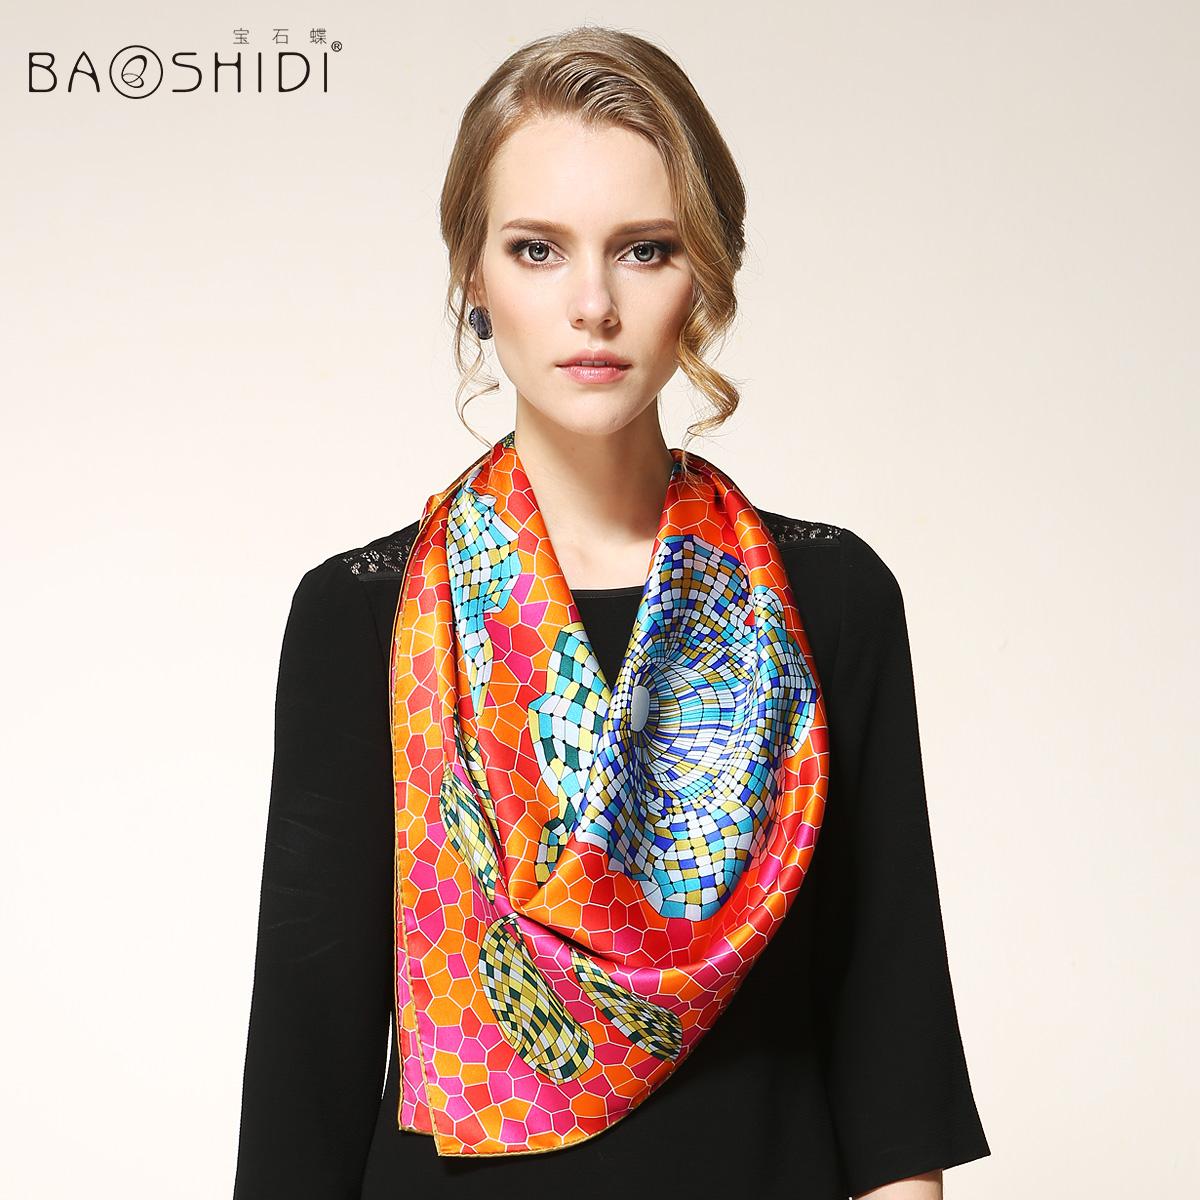 100% Foulard Women Fashion Brand Silk Lady Scarf Designers Shawls Fast Arrival Dhl Express Free Shipping 88x88cm(China (Mainland))